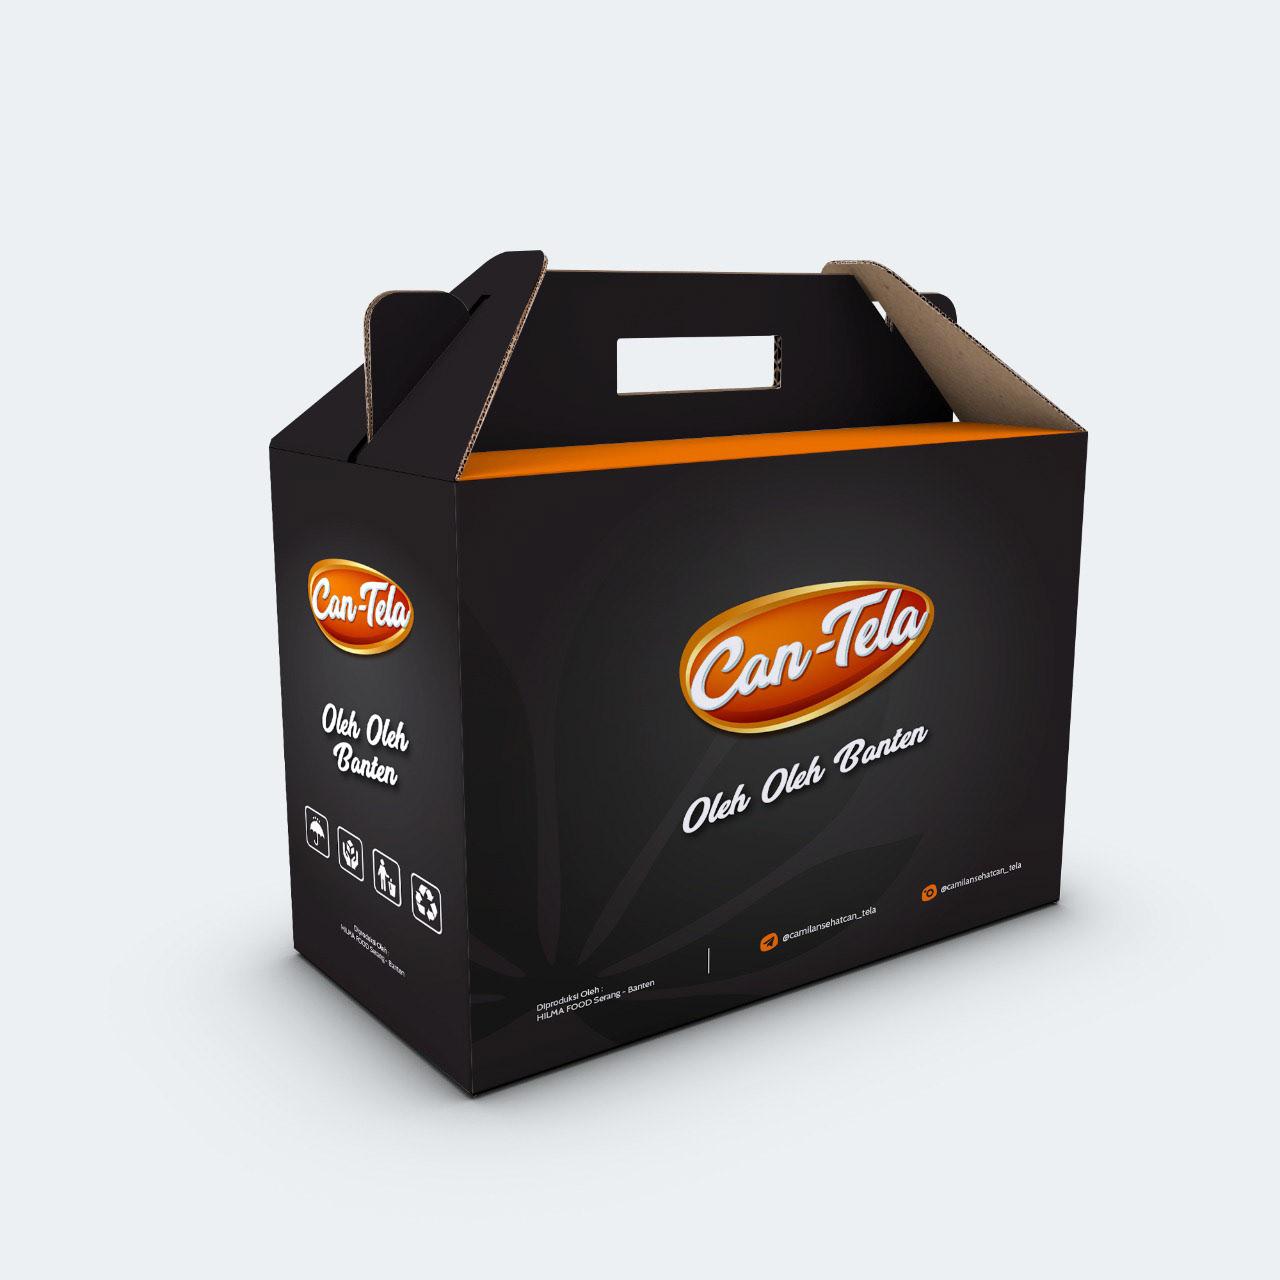 Can-Tela